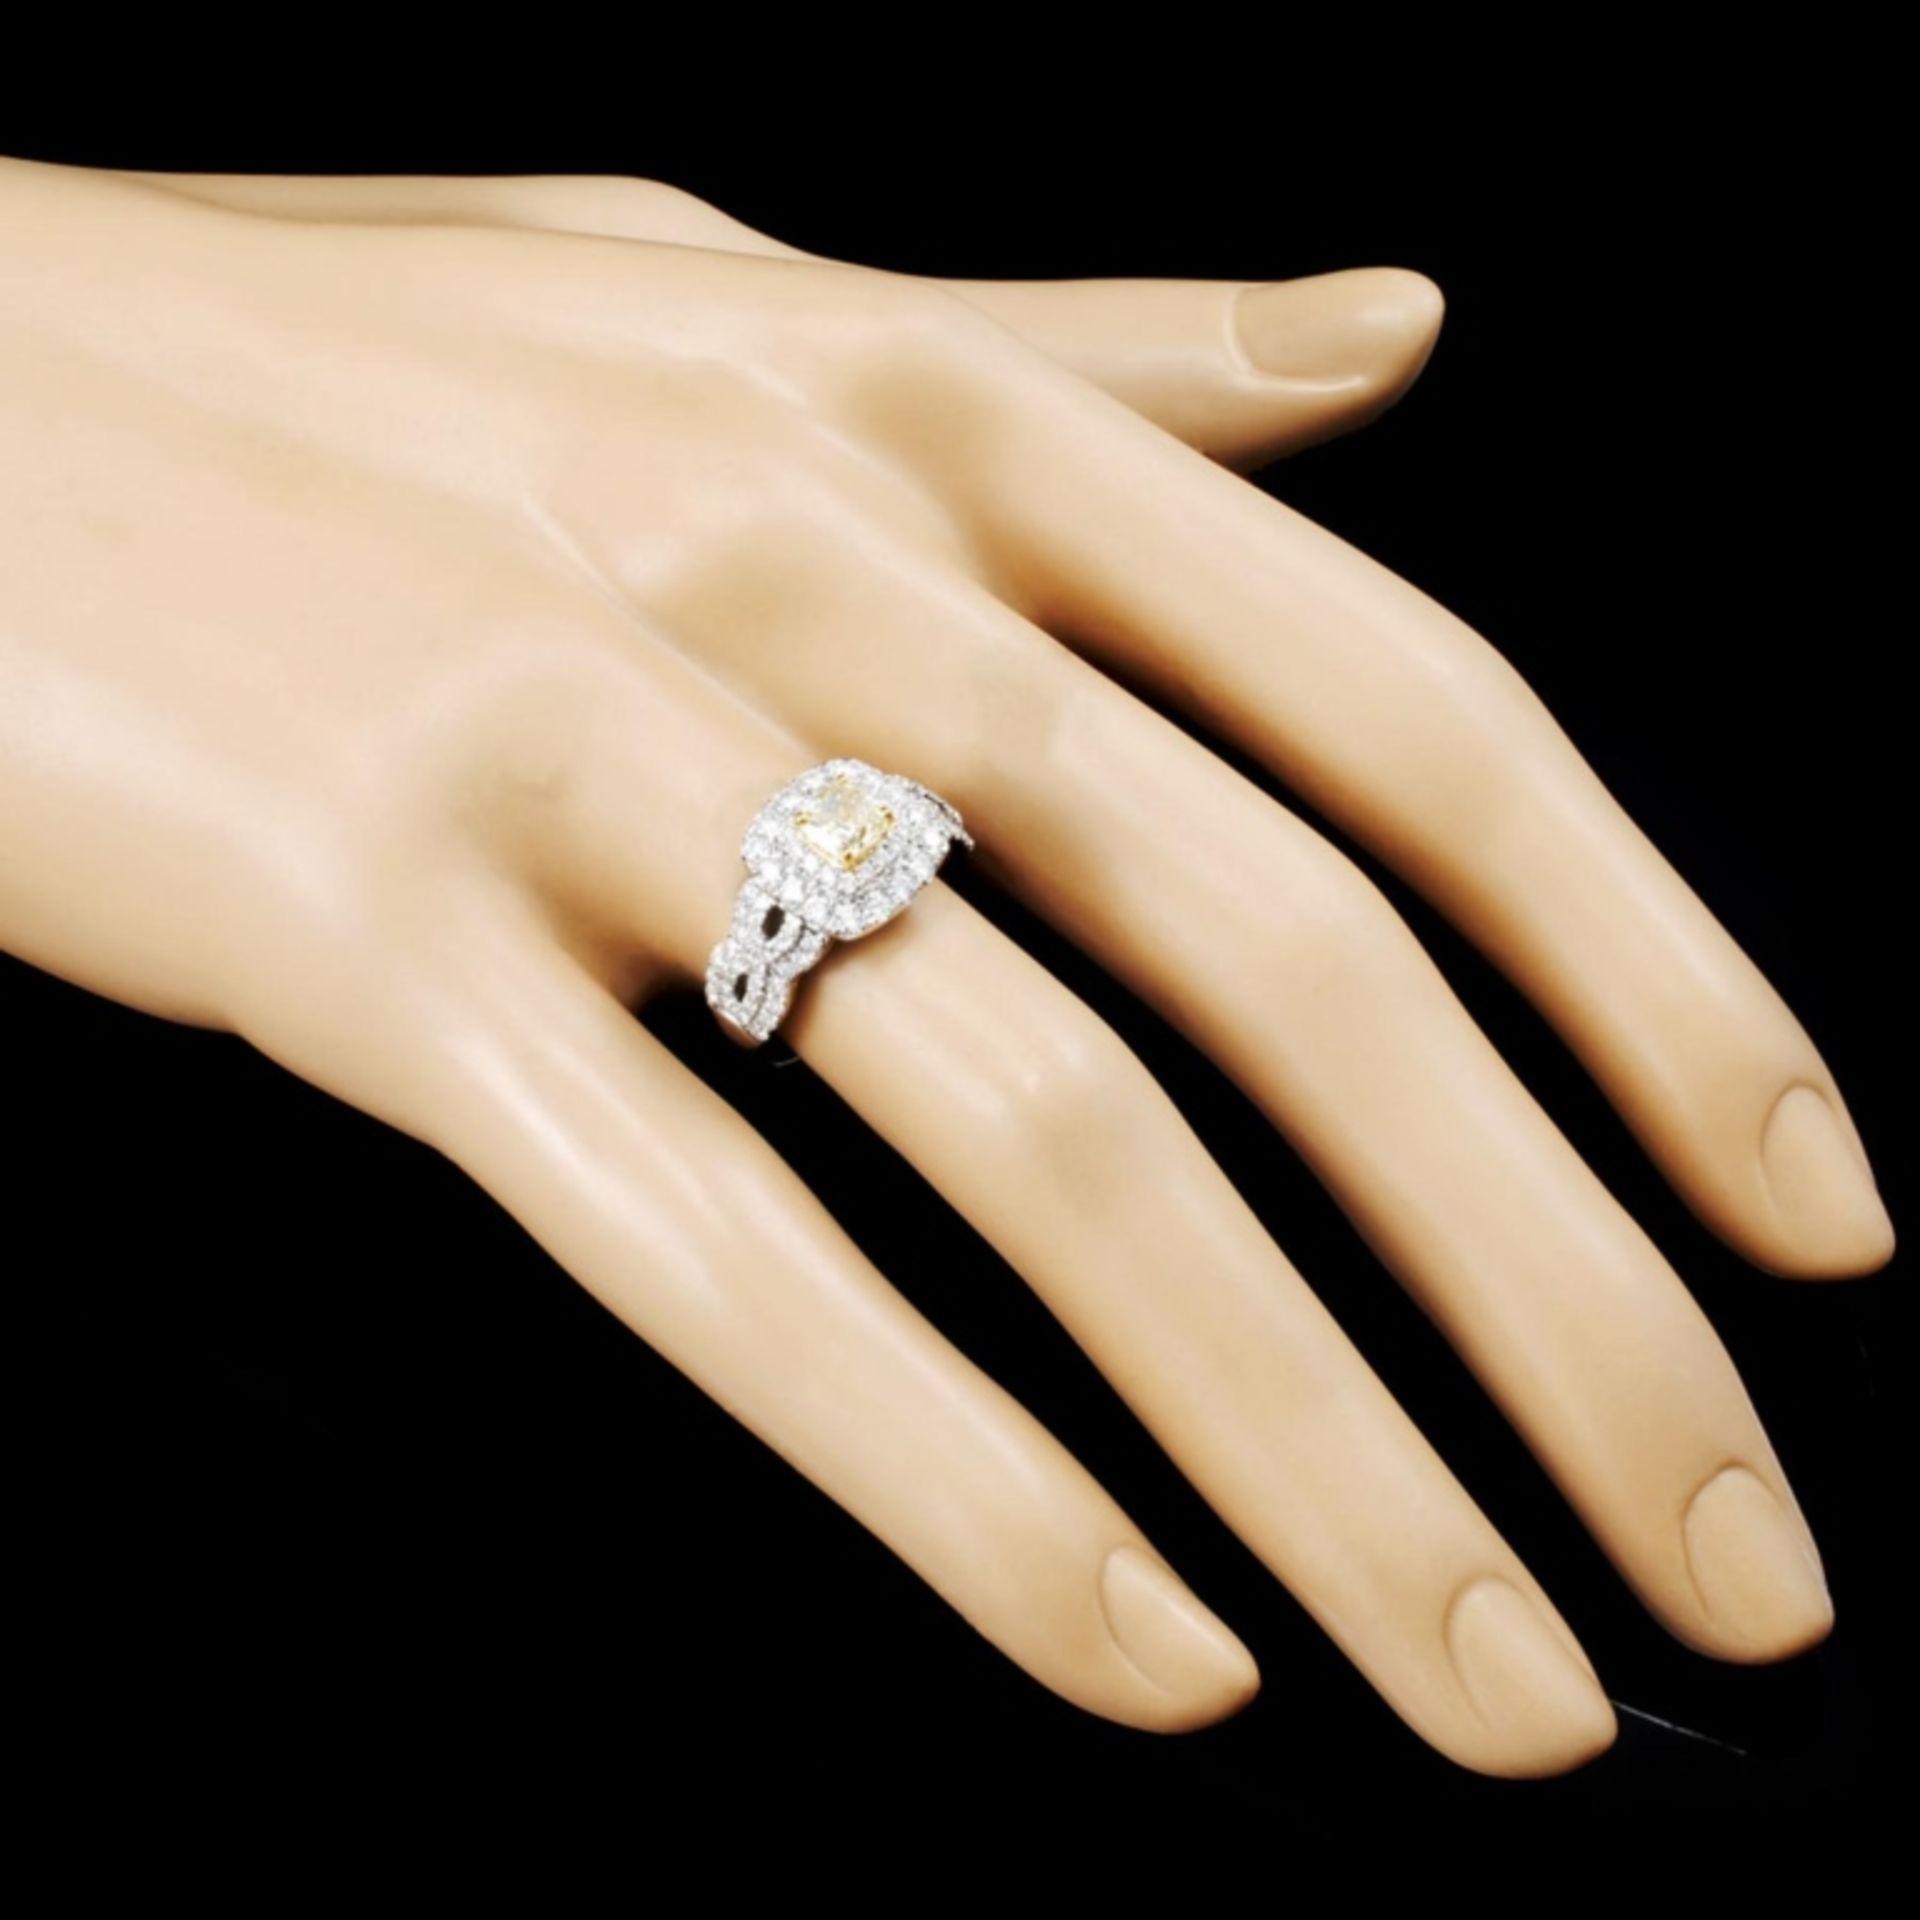 18K Gold 1.52ctw Fancy Diamond Ring - Image 3 of 5